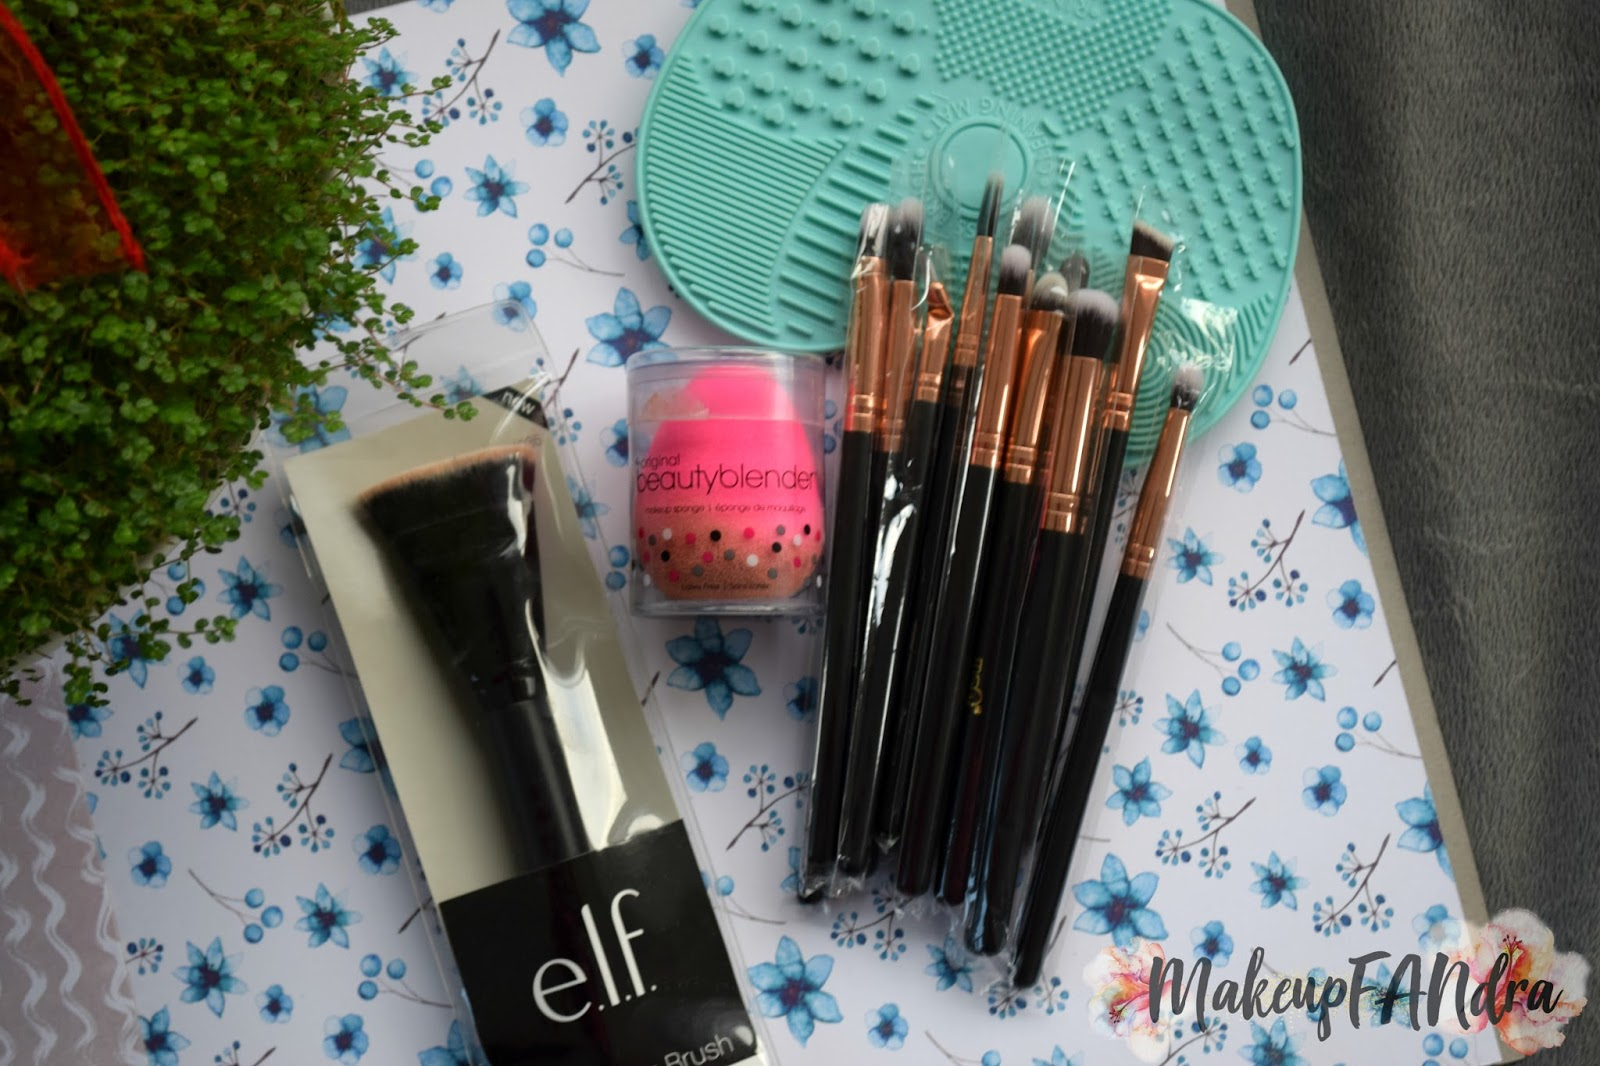 Elf-kist-za-konturiranje-Original-Beauty-Blender-e-bay-kistovi-za-sjenila